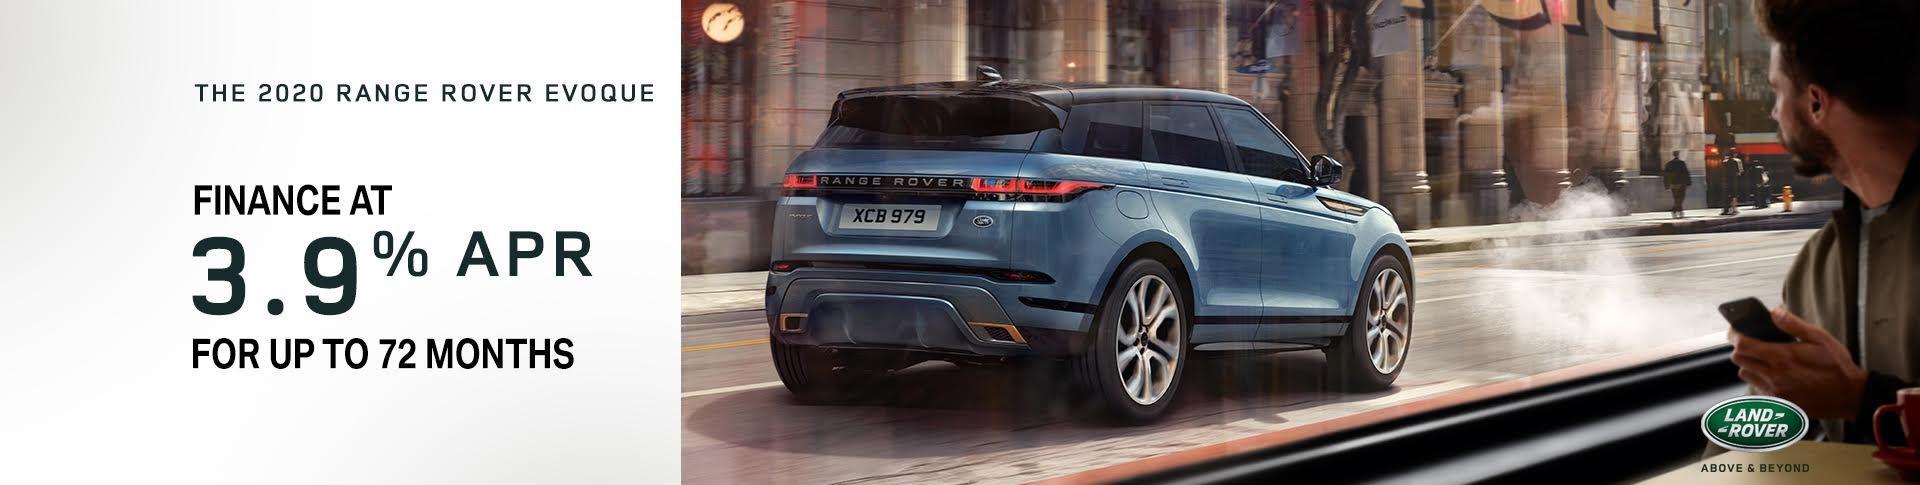 The 2020 Range Rover Evoque